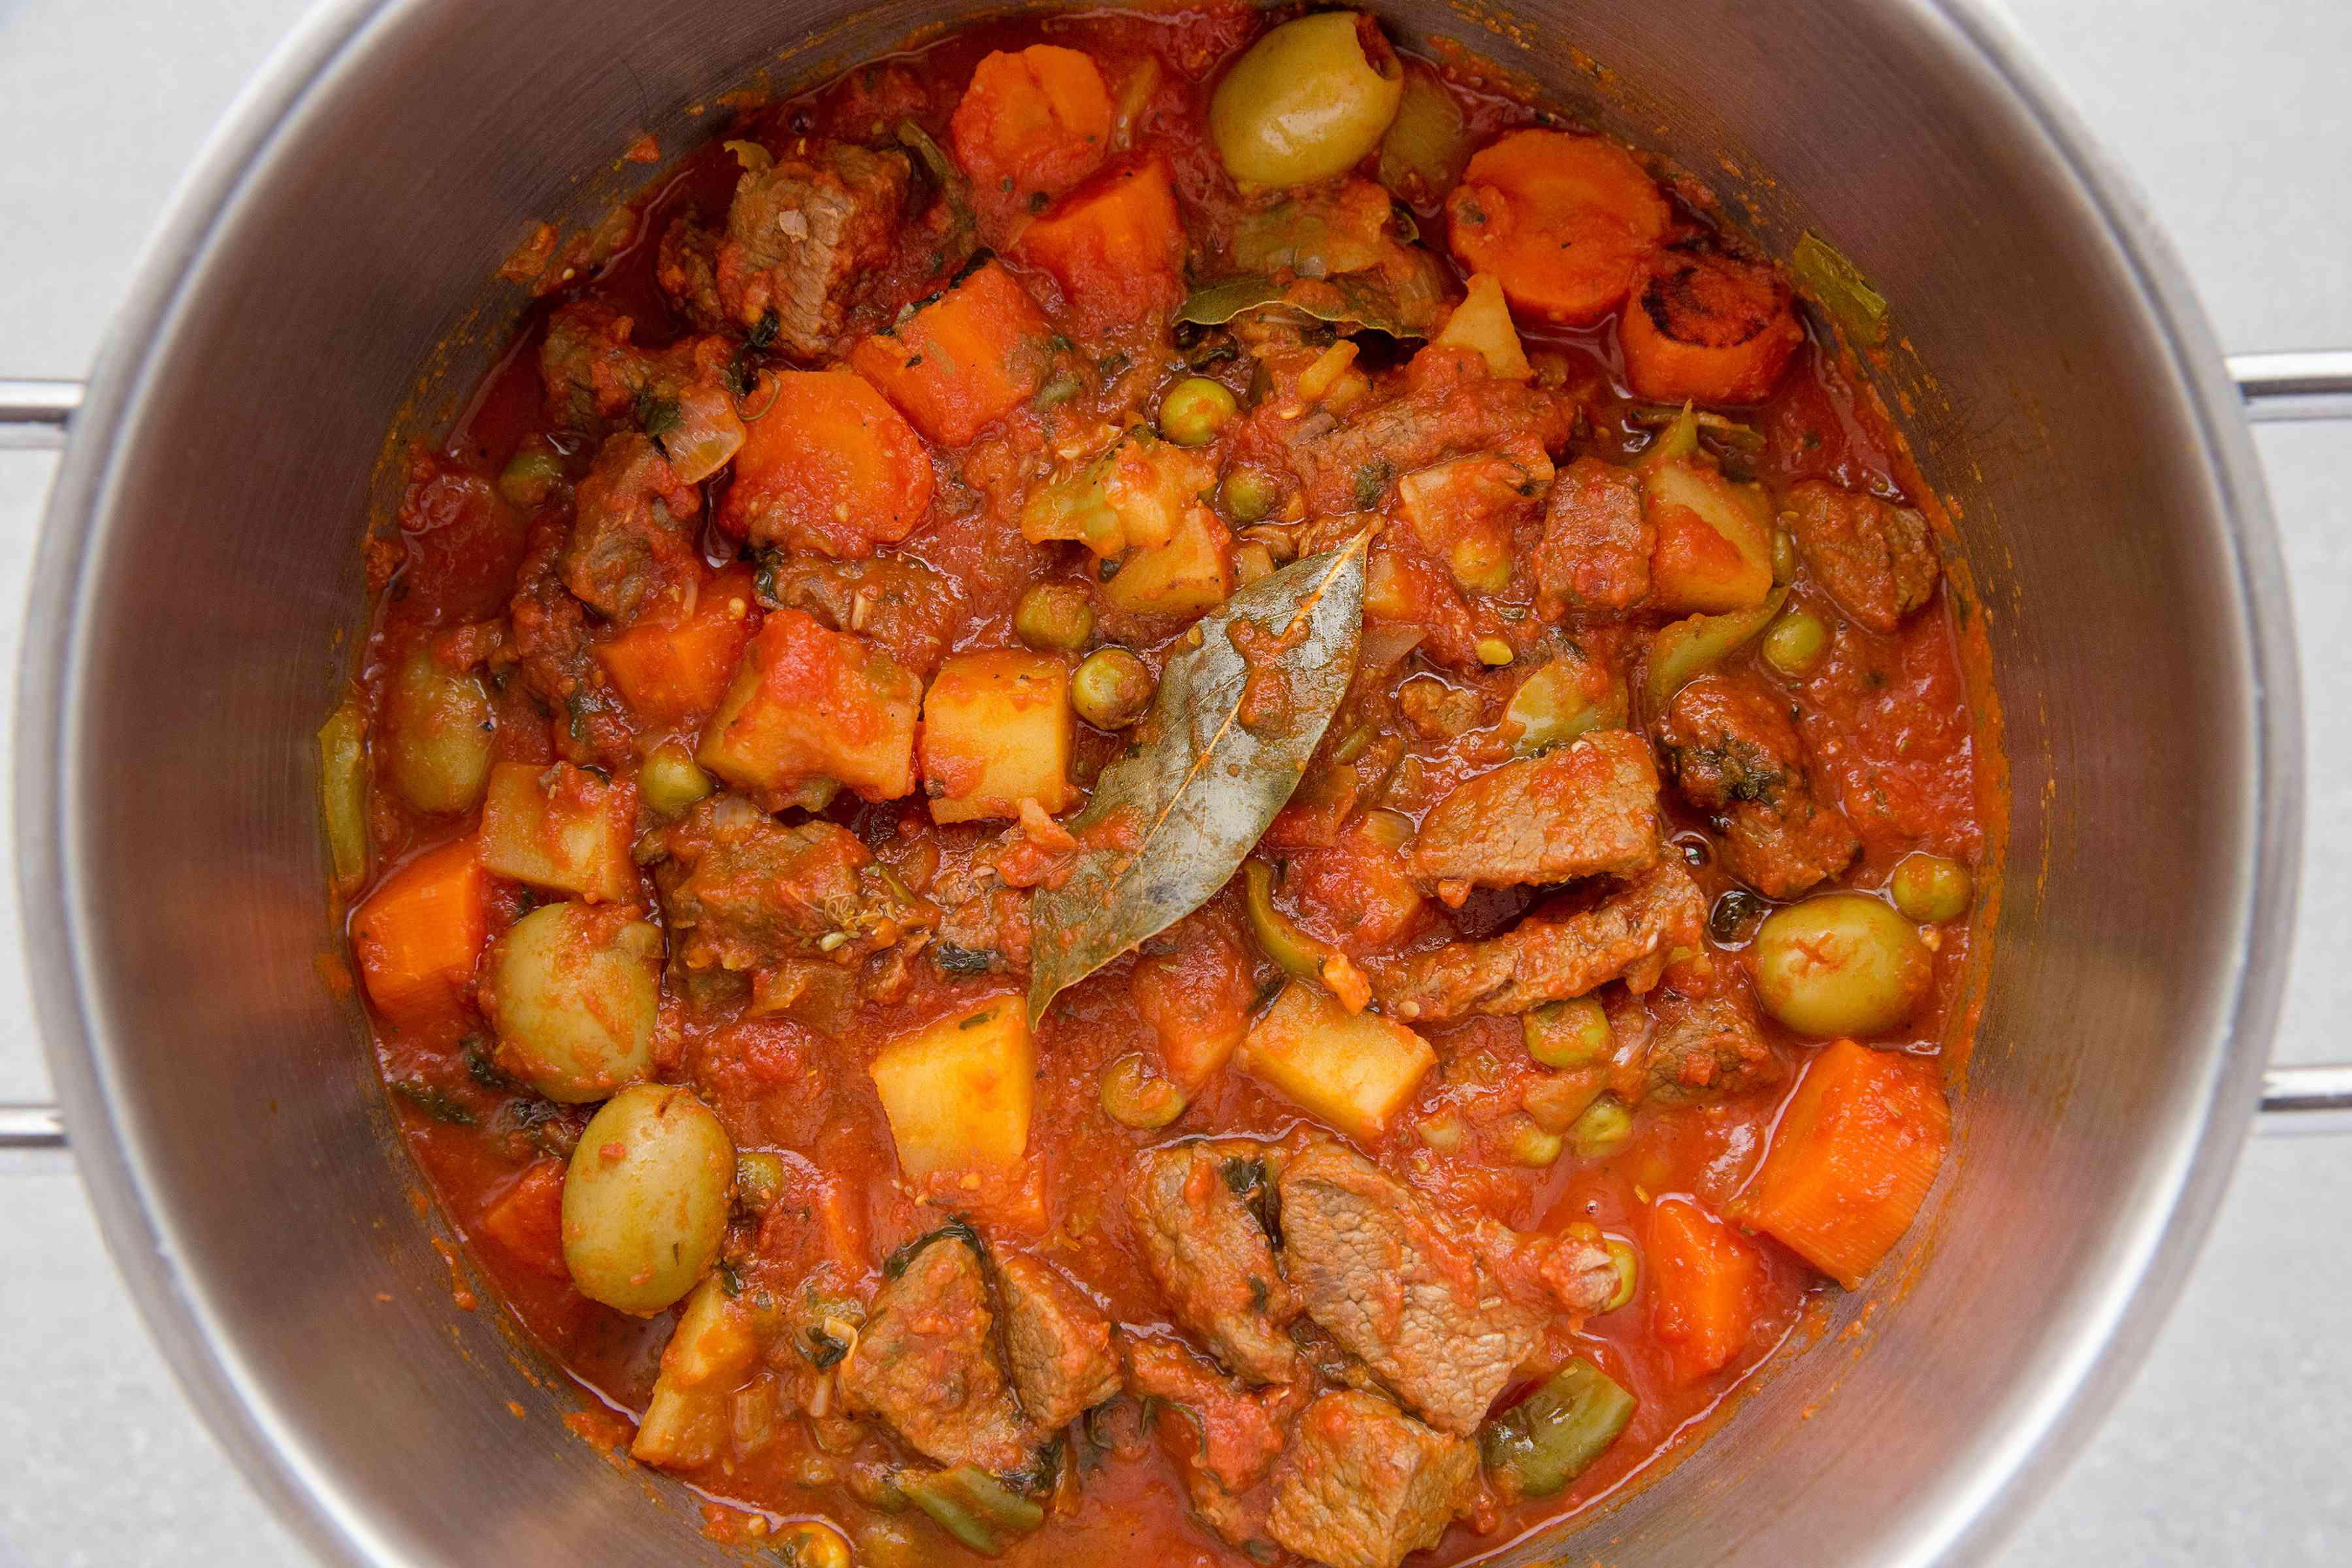 Caribbean Beef Stew (Carne Guisada) in a pot